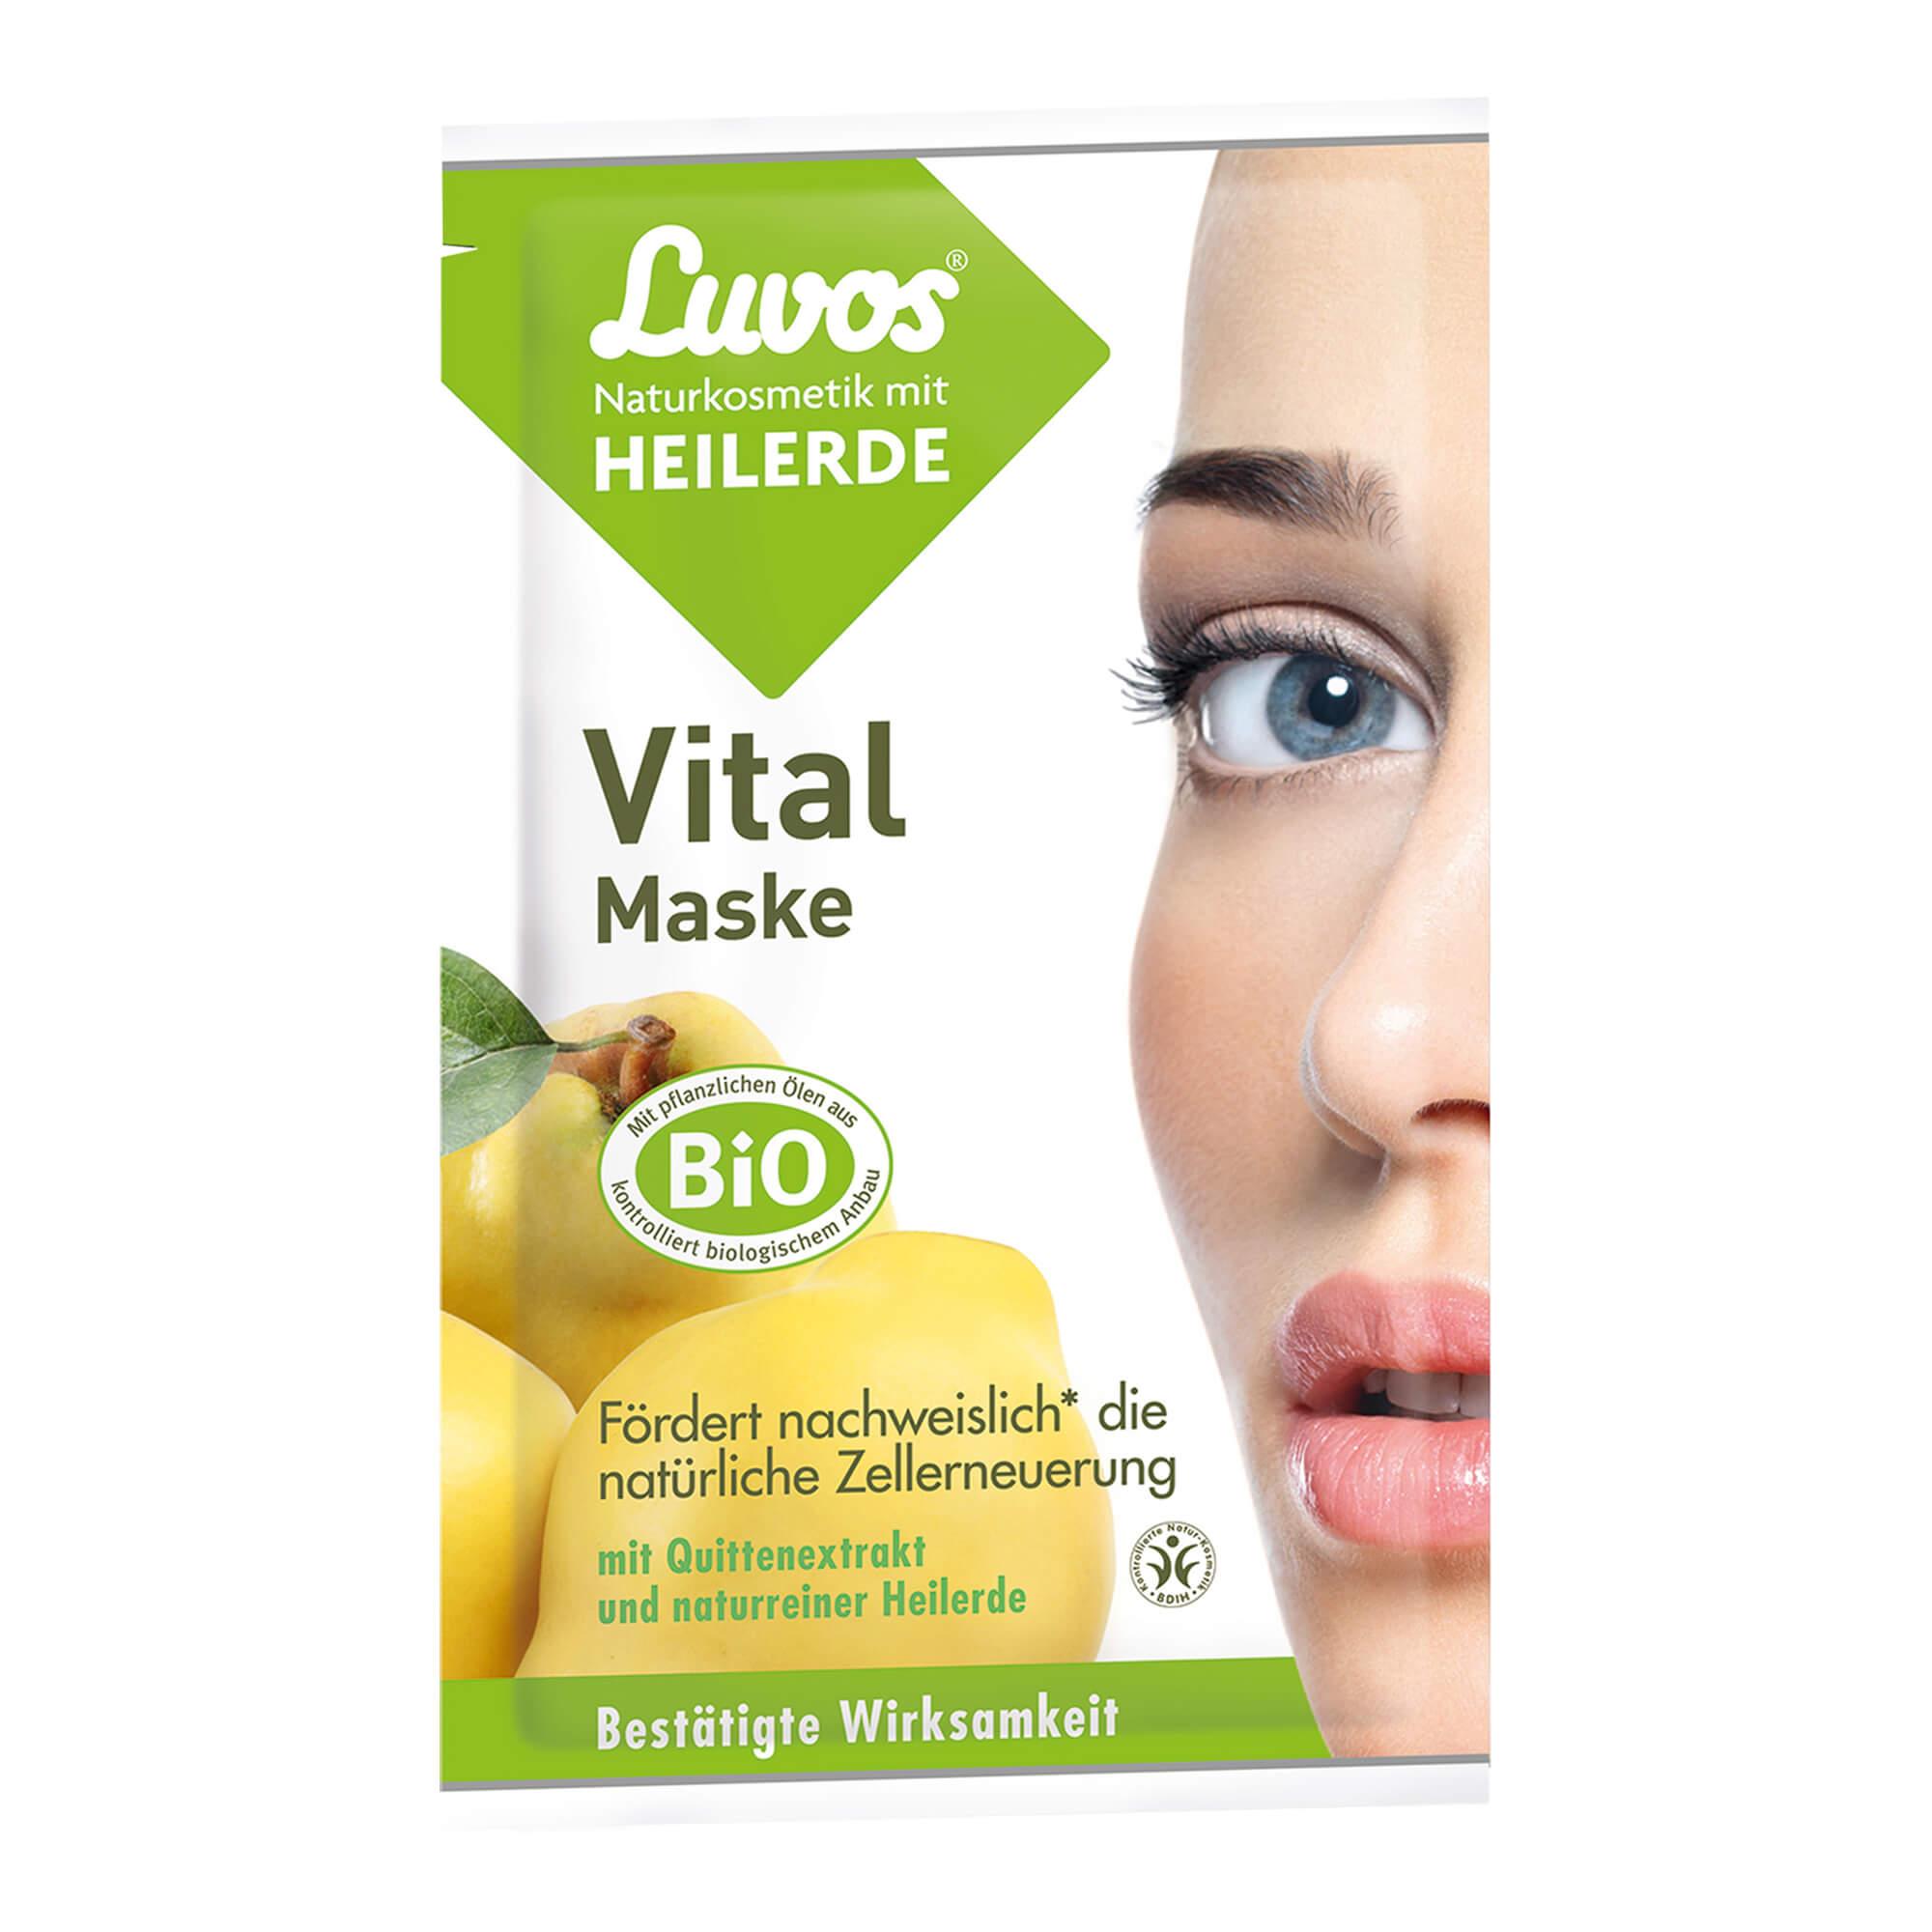 Luvos Naturkosmetik Heilerde Vital Maske